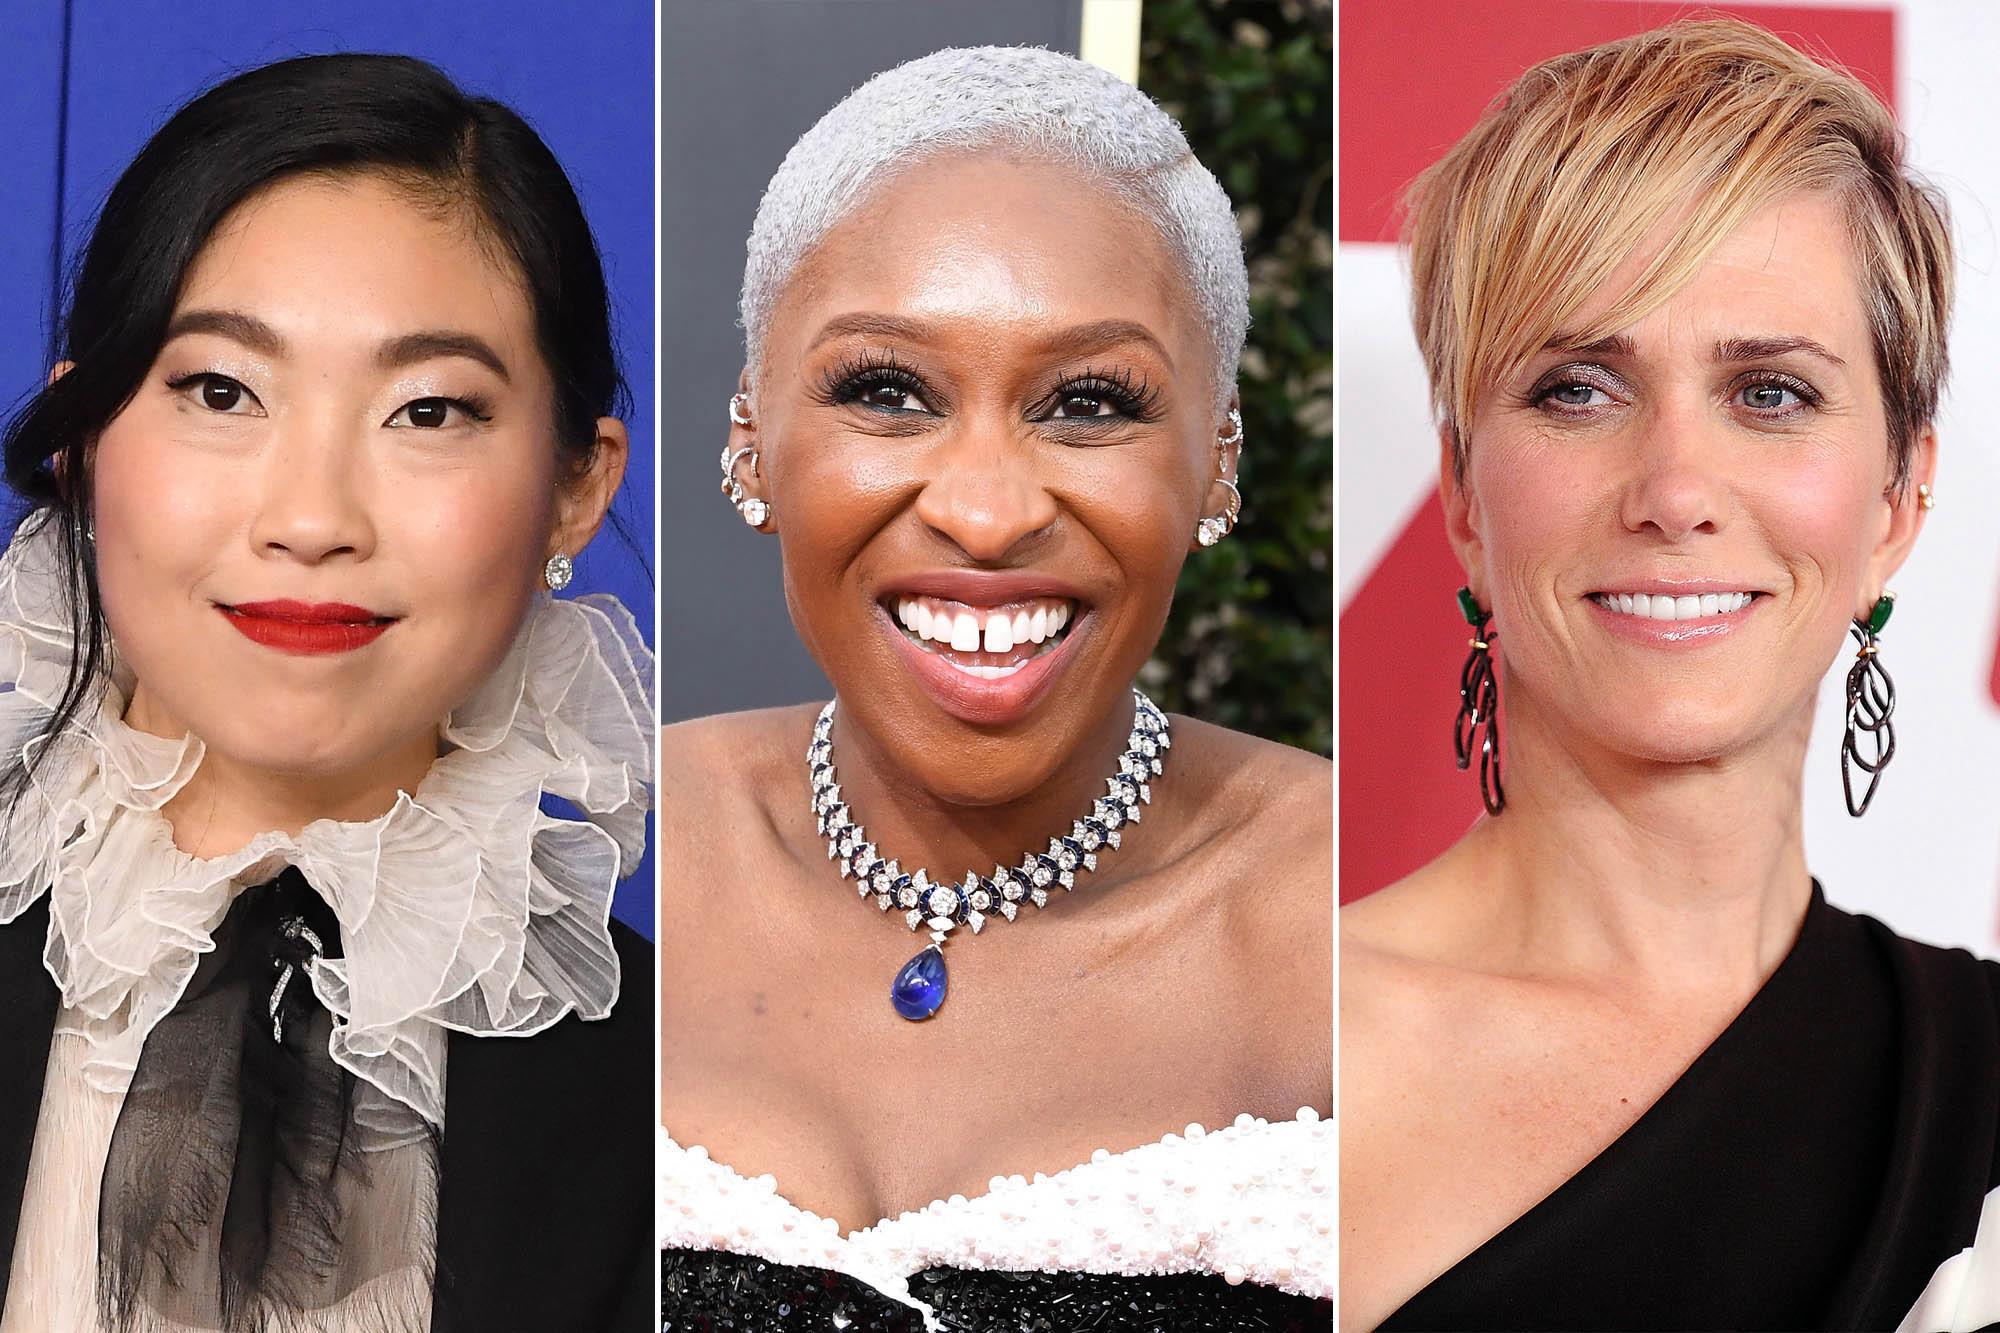 Golden Globes 2021 presenters announced